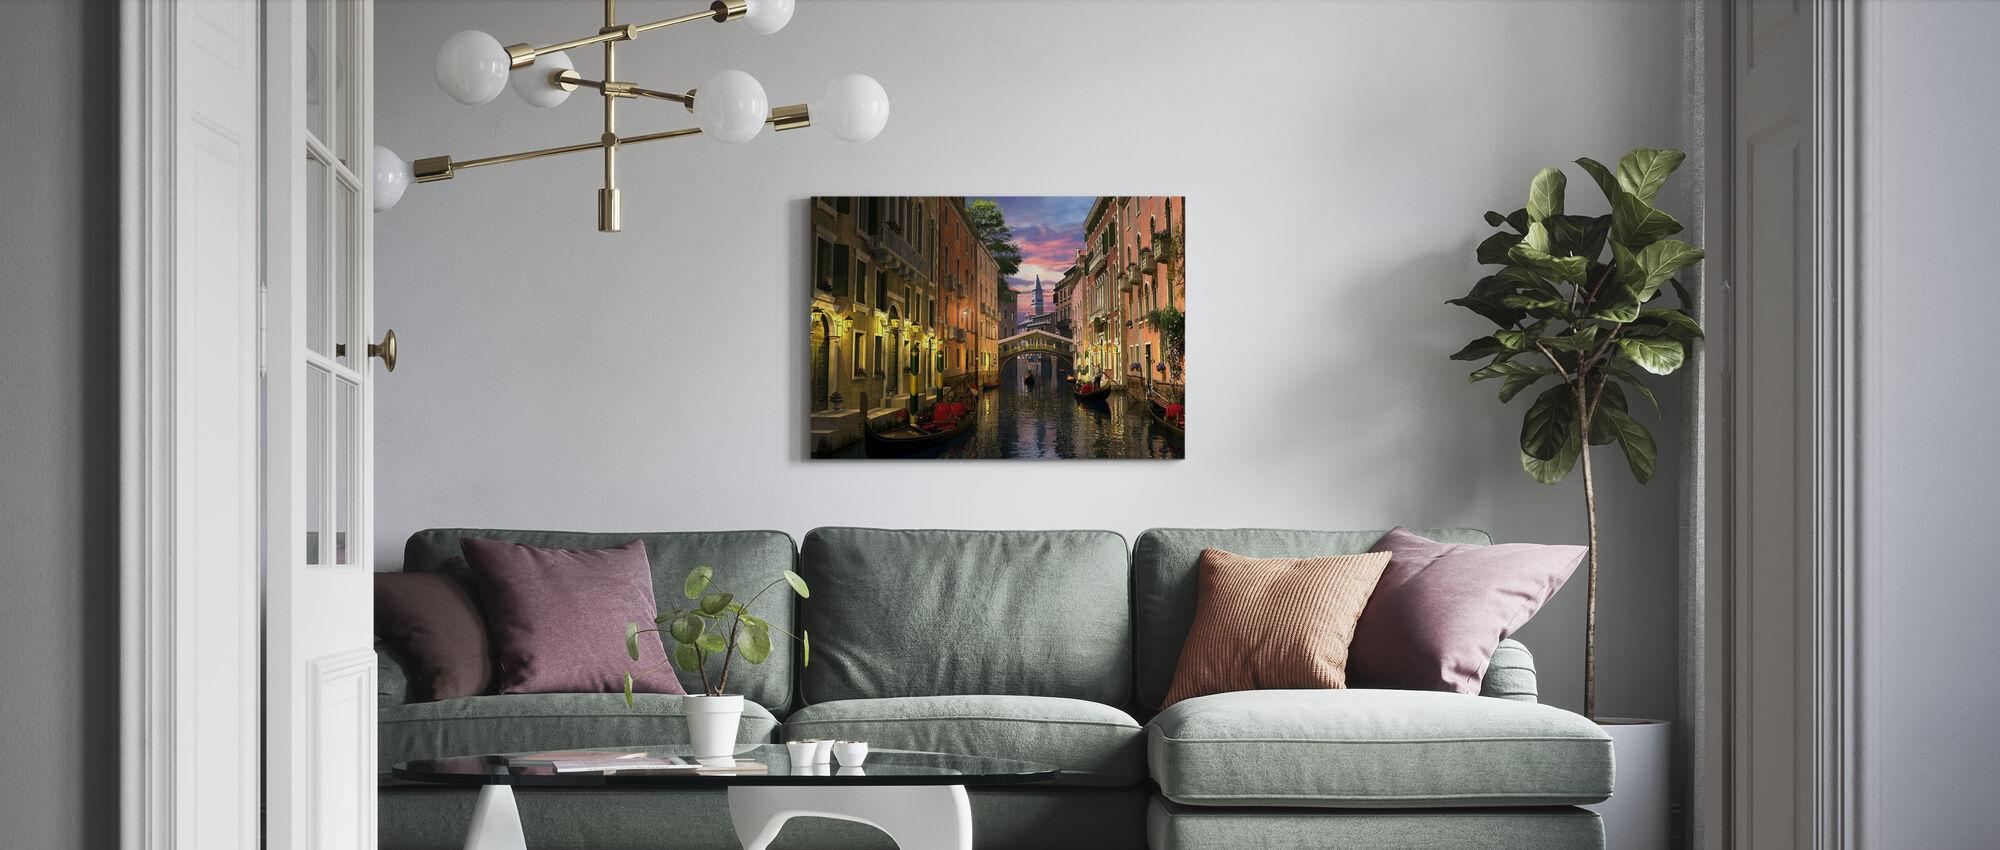 Venice at Dusk - Canvas print - Living Room